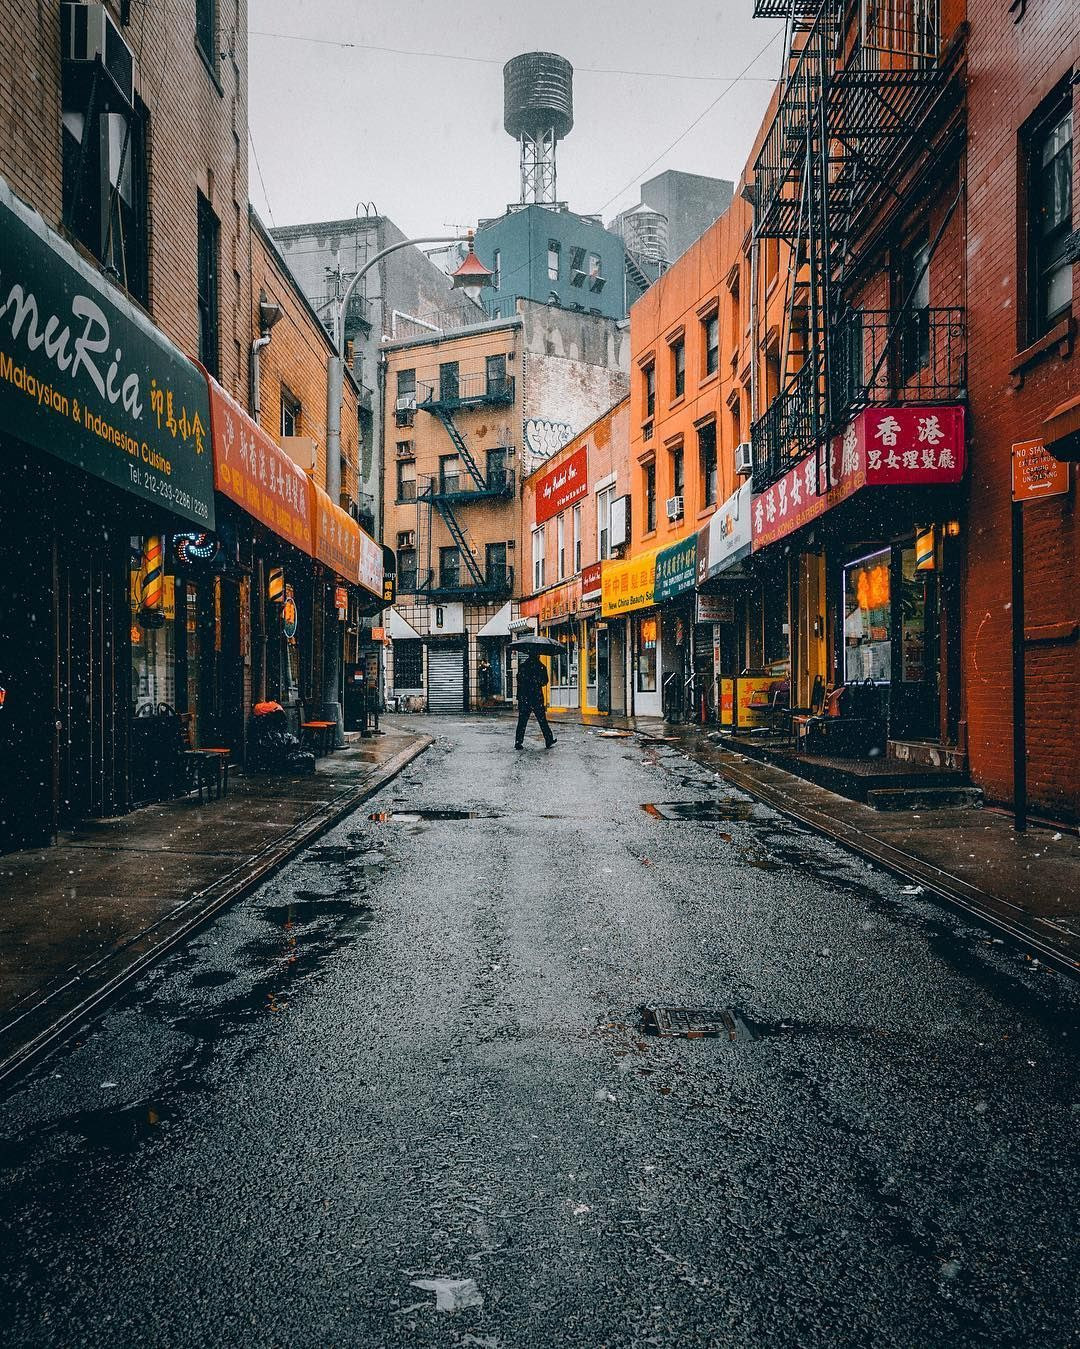 Vibrant Street Photographs Of New York City By Henry Kornaros Inspiration Photography Scenery Photography City City Streets Photography City Landscape